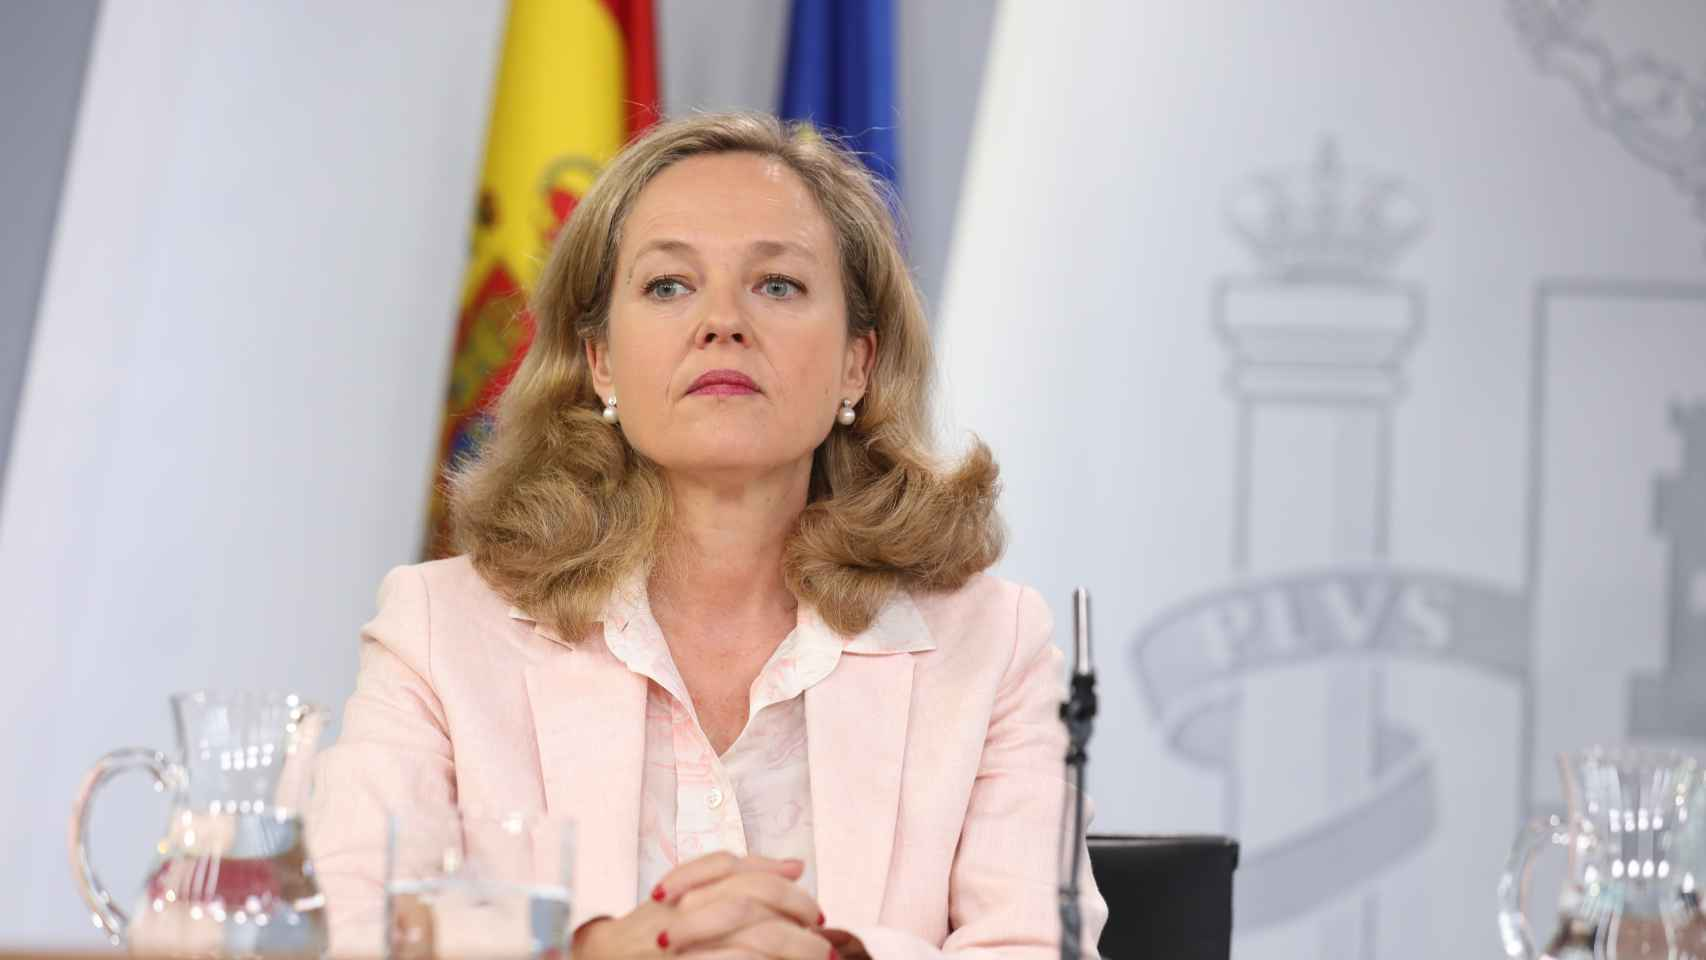 Nadia Calviño retira su candidatura para dirigir el Fondo Monetario Internacional (FMI)